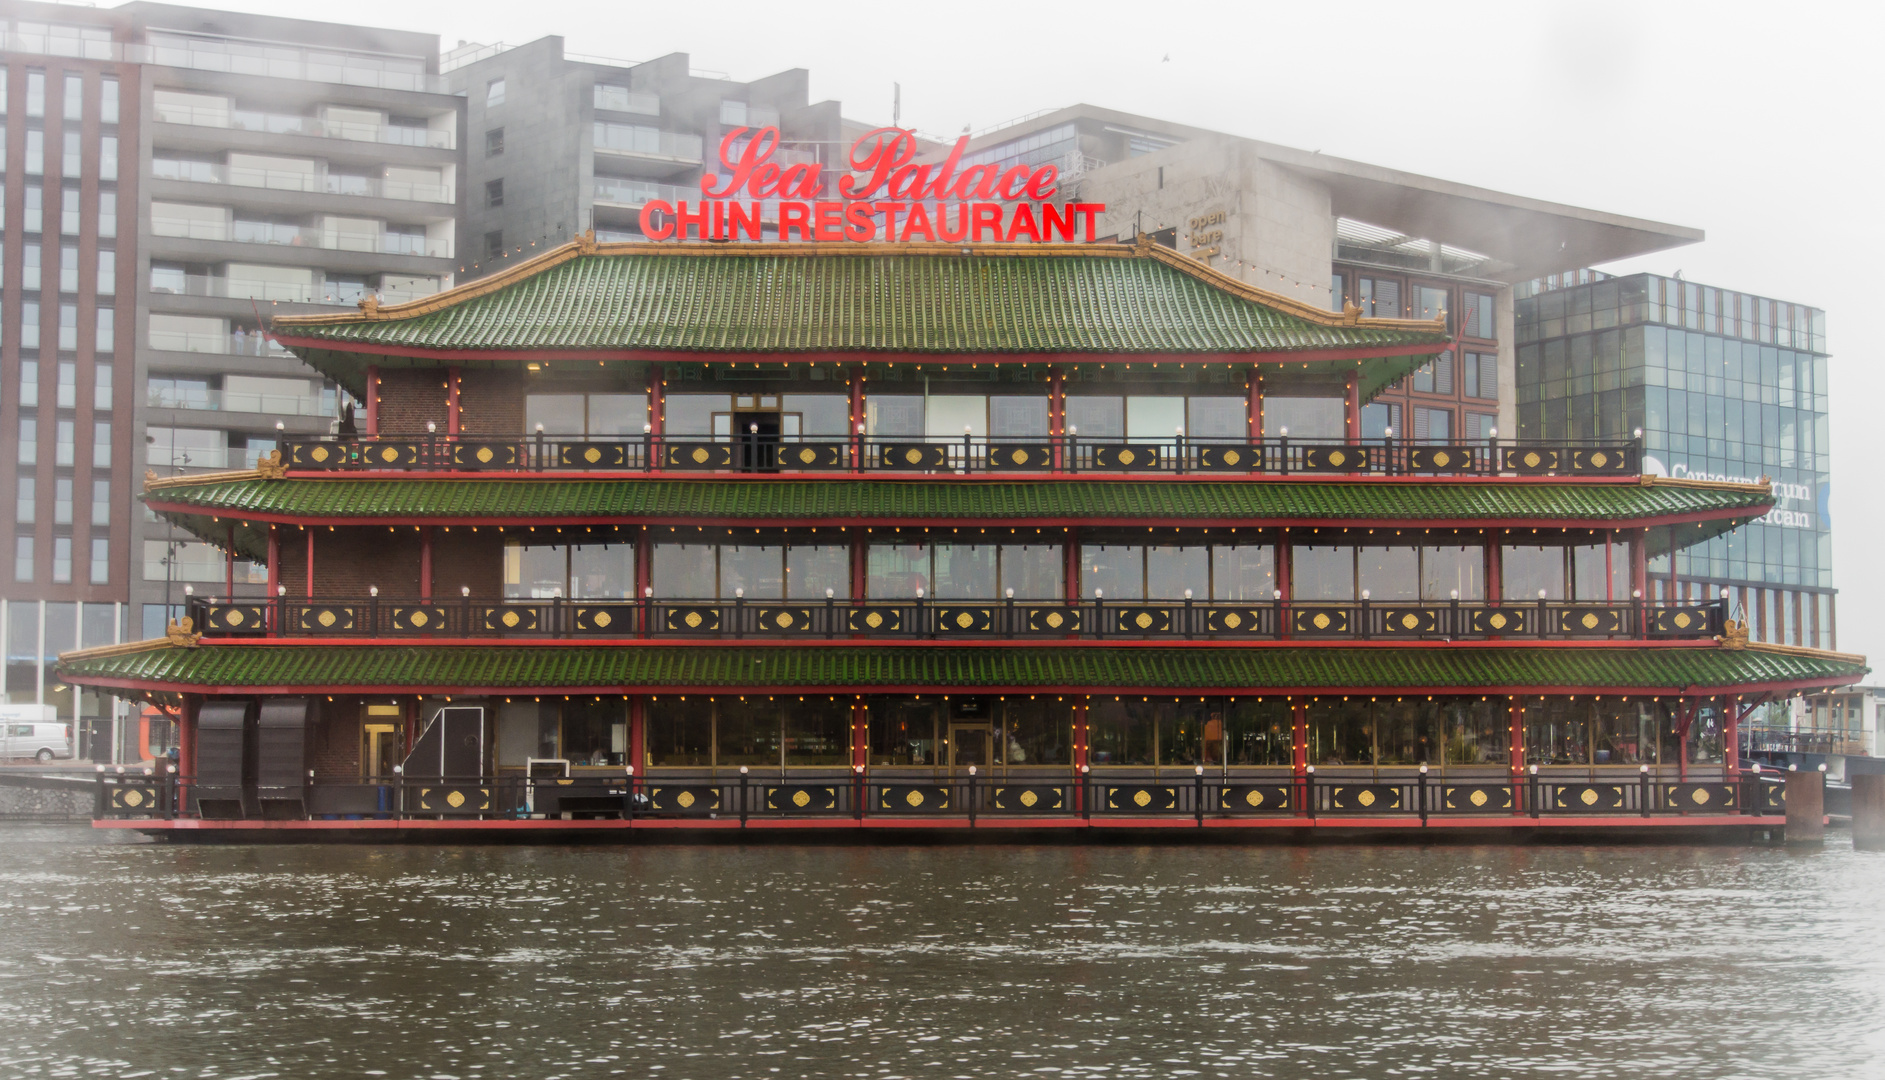 Sea Palace - schwimmendes Chinarestaurant in Amsterdam